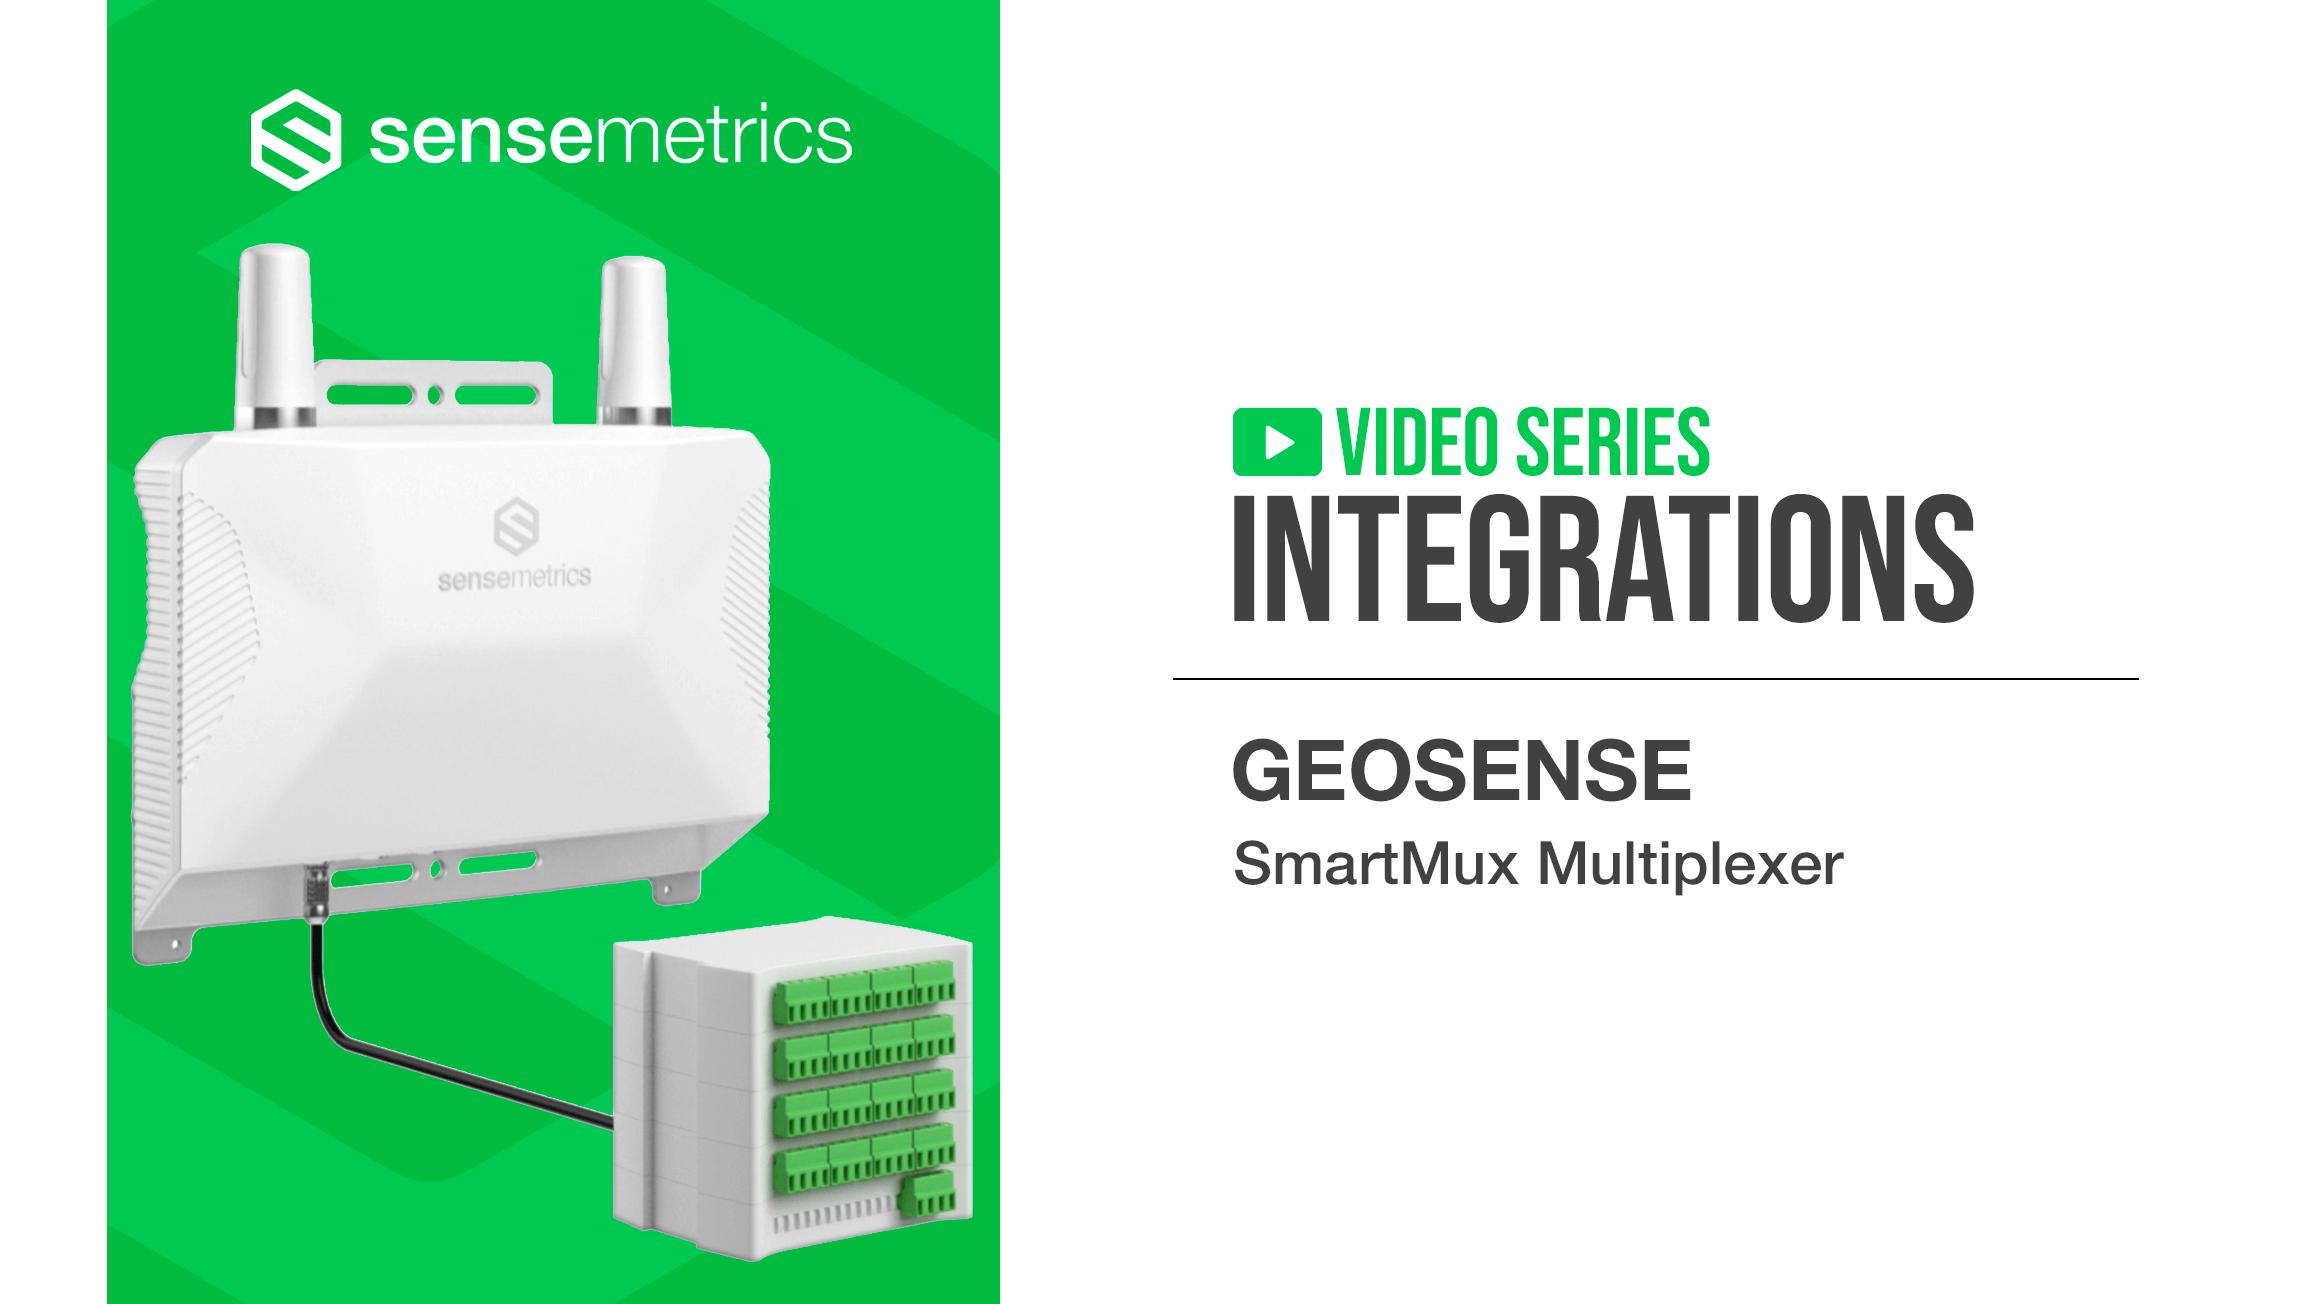 New Integration: Geosense SmartMux